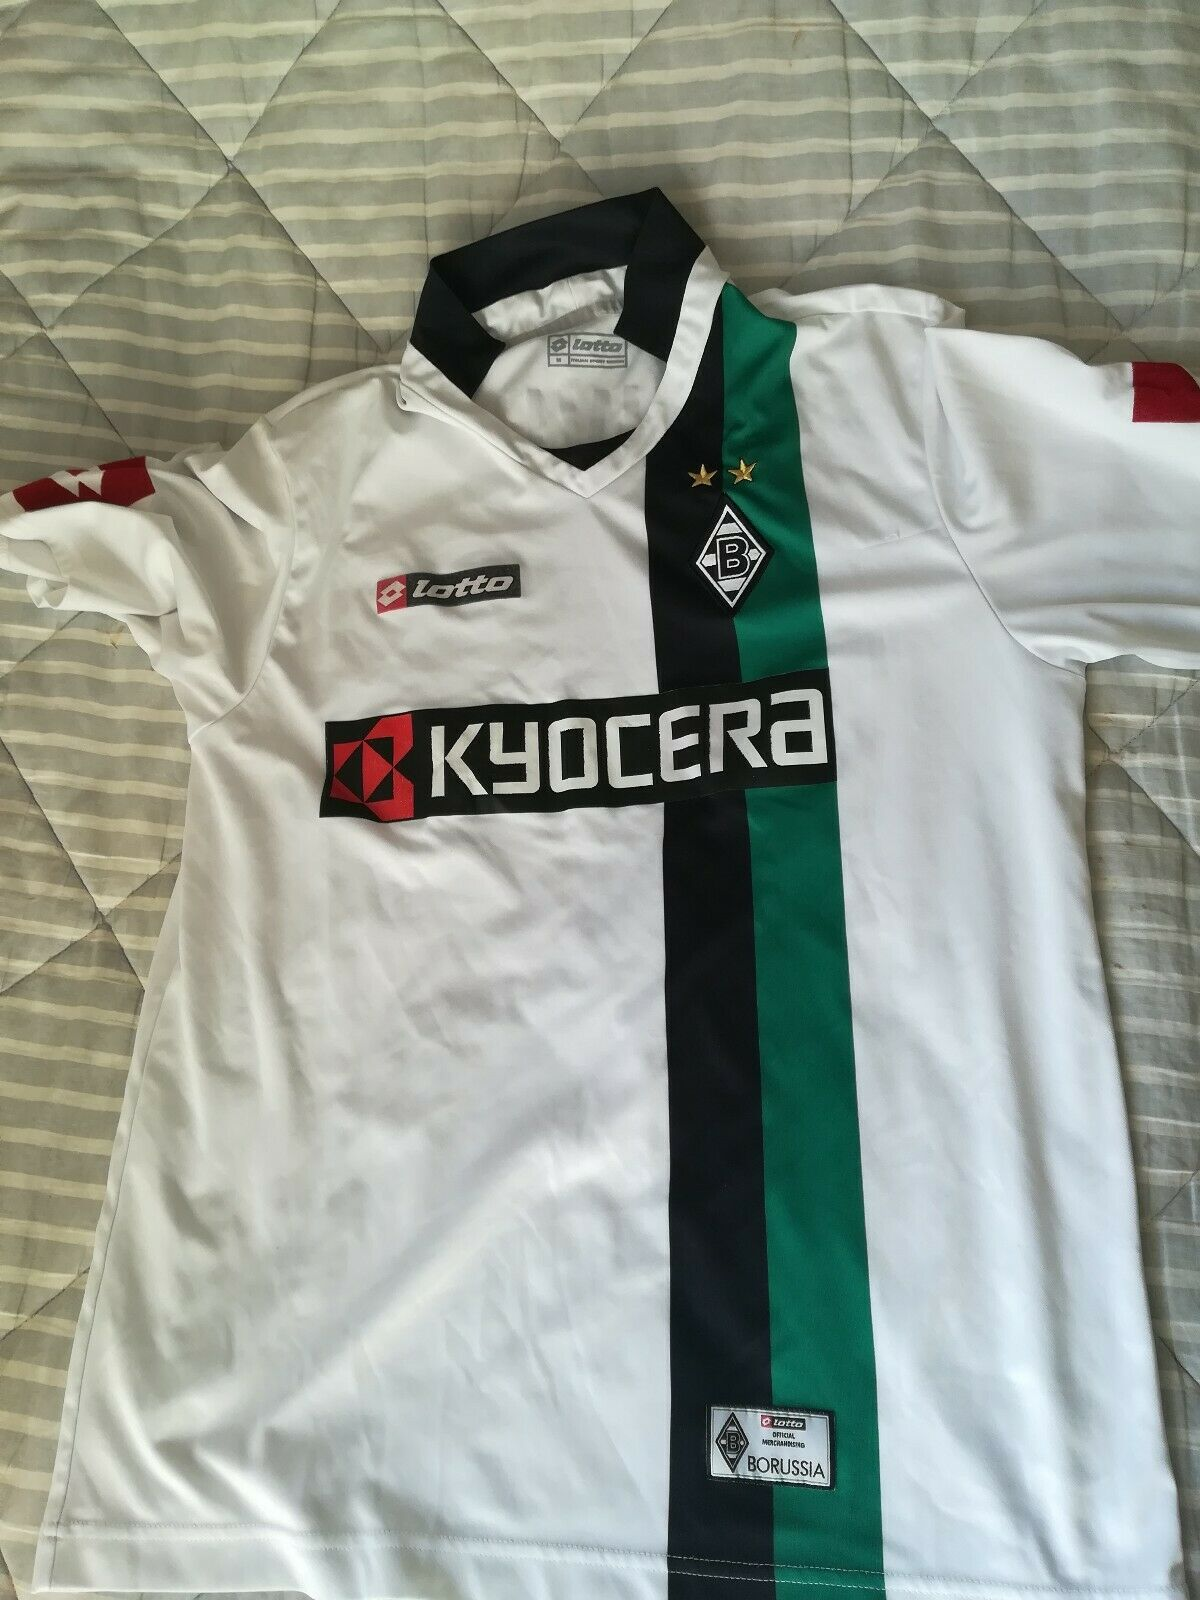 Borussia mönchengladbach lotto Trikot 09 10 Gr. M away  27 neuville    Genial